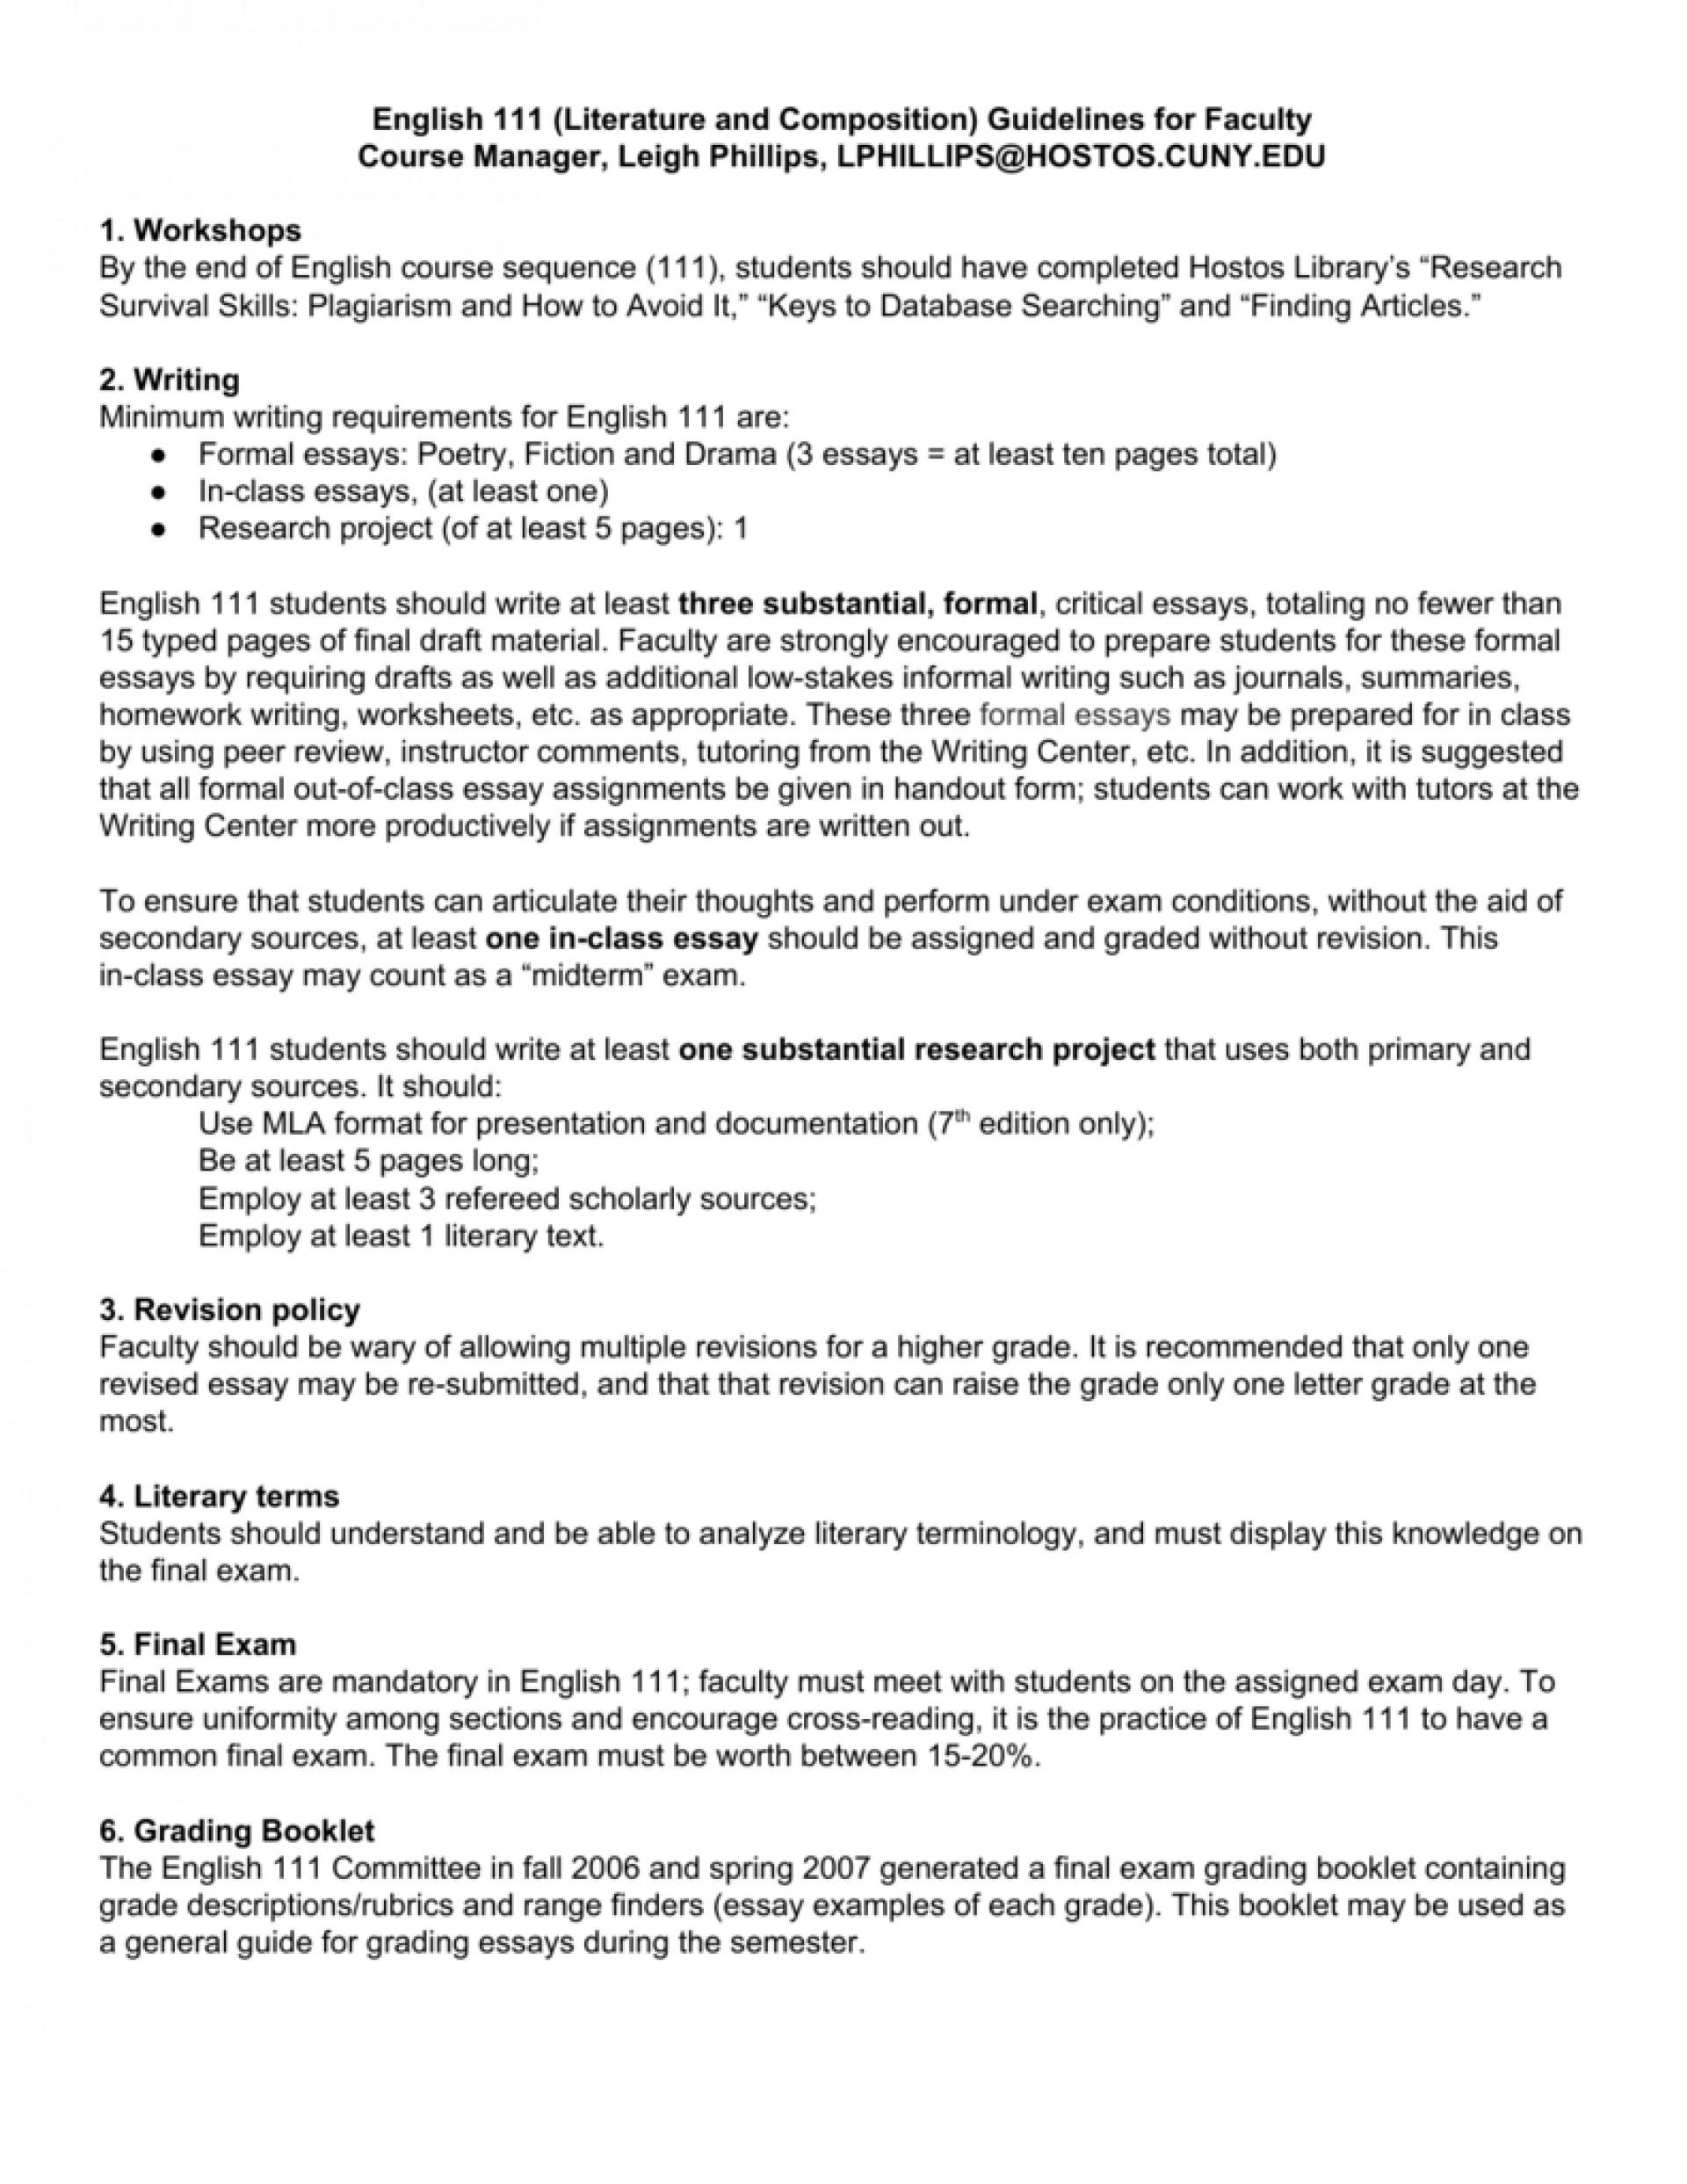 007 Essay Example 008210852 1 Writing On Examination Rare Day 1920